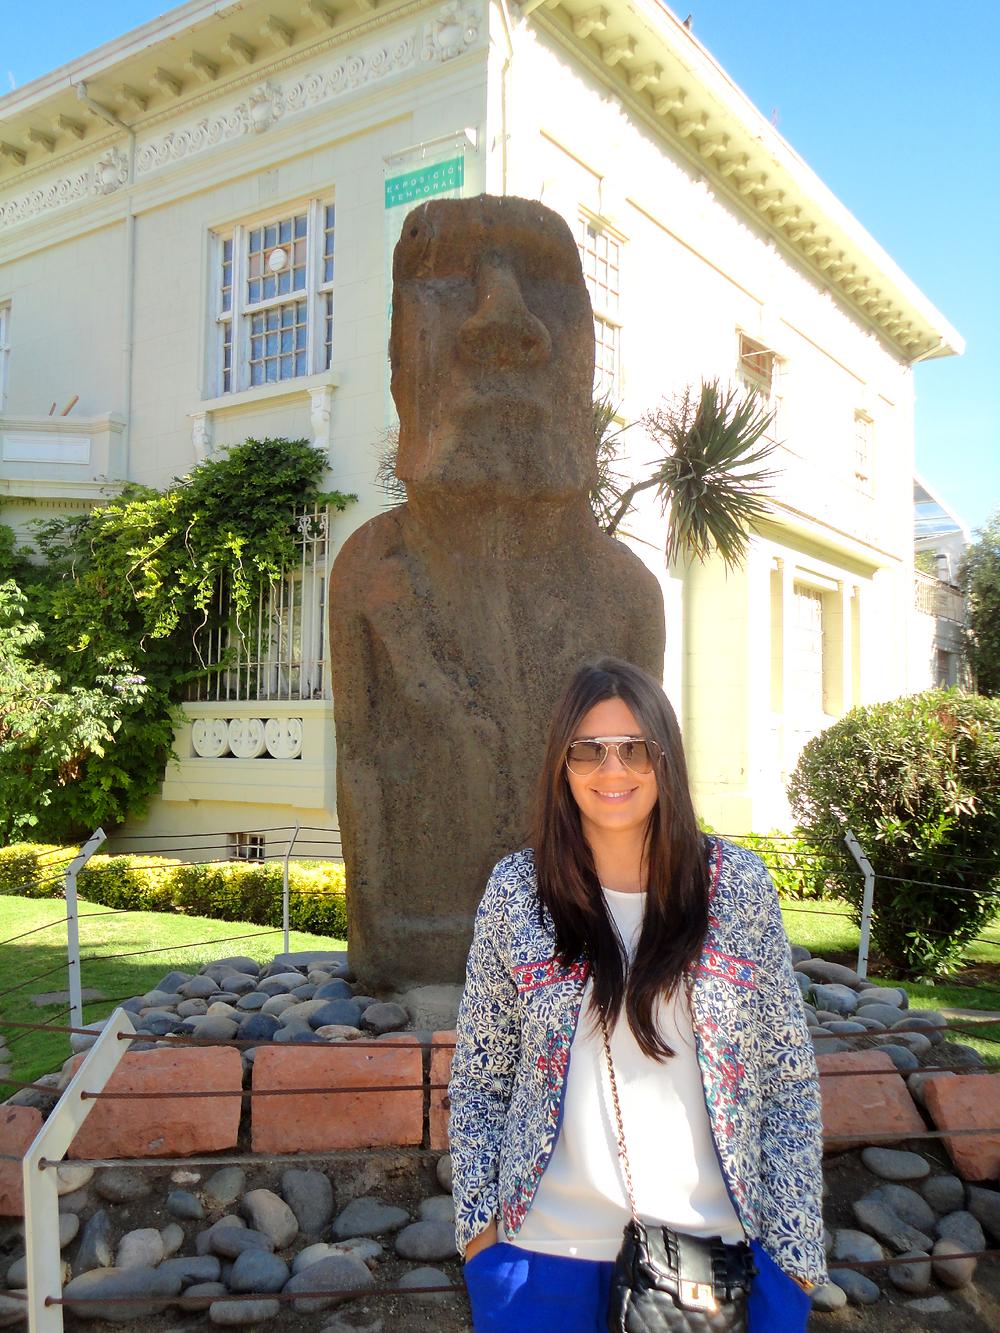 Museo de Arqueologia Francisco Fonck - Viña del Mar - Chile